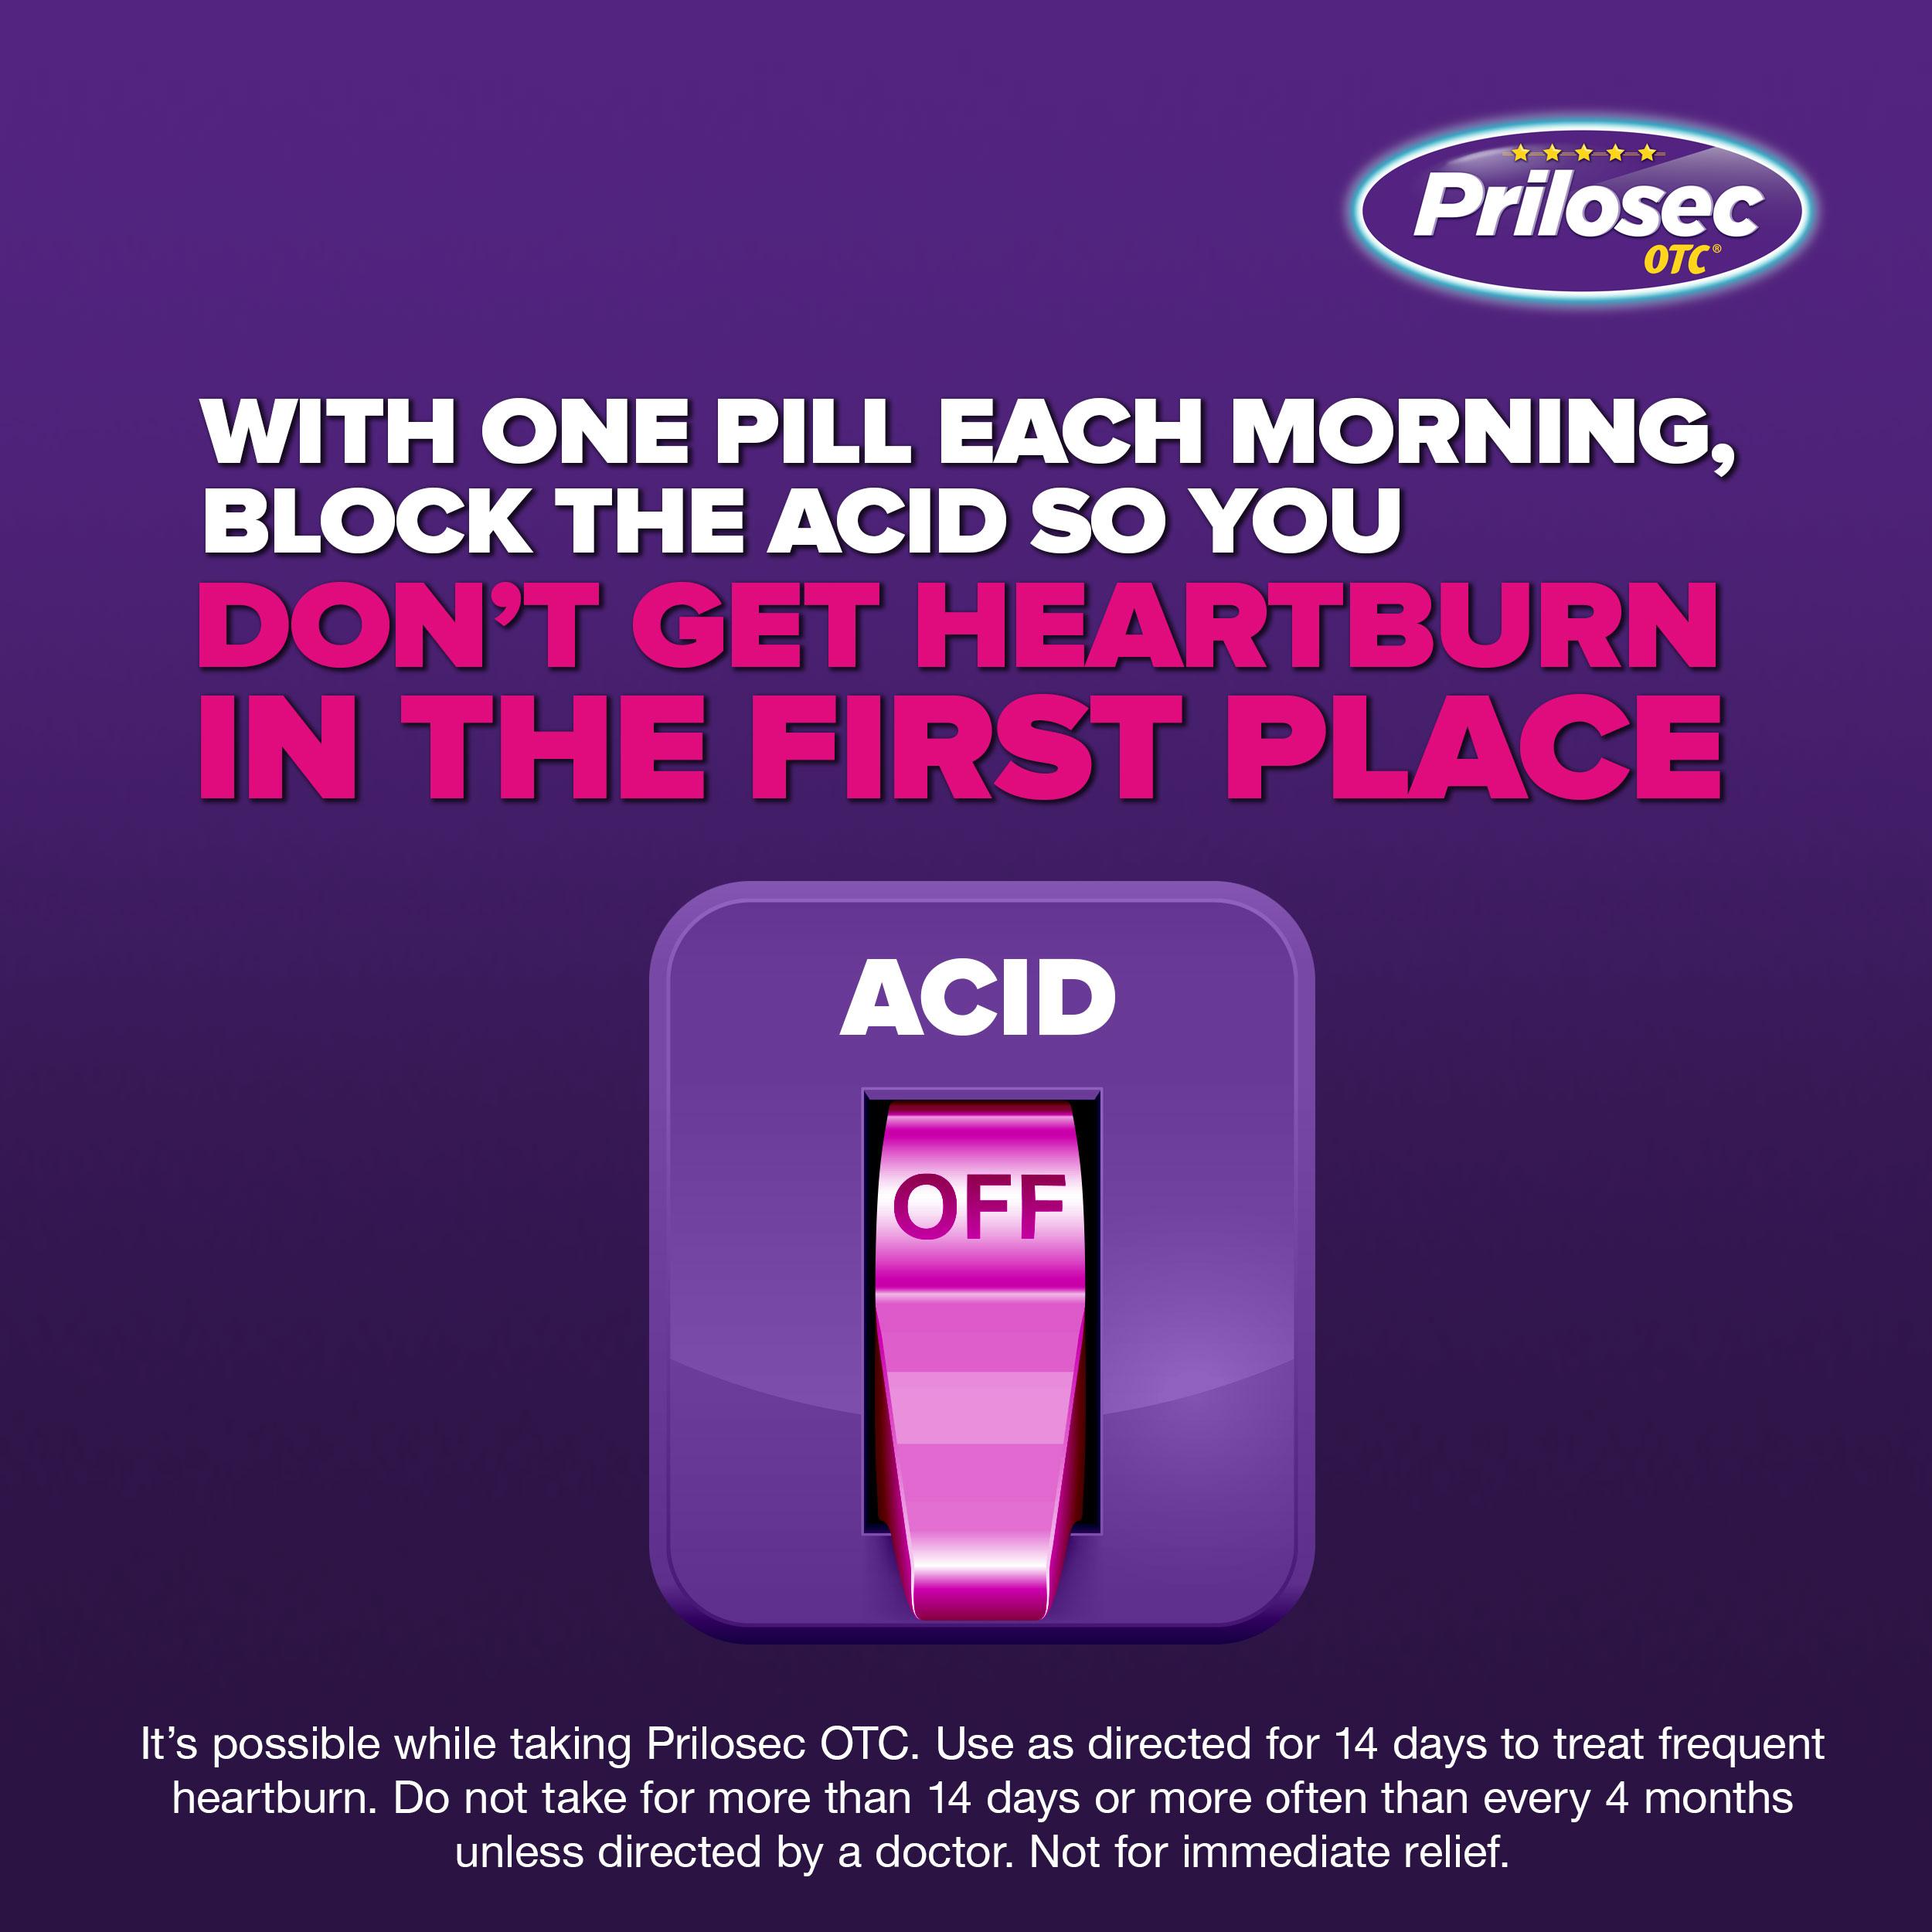 Prilosec OTC Frequent Heartburn Medicine and Acid Reflux Reducer Tablets 42  Count - Omeprazole - Proton Pump Inhibitor - PPI